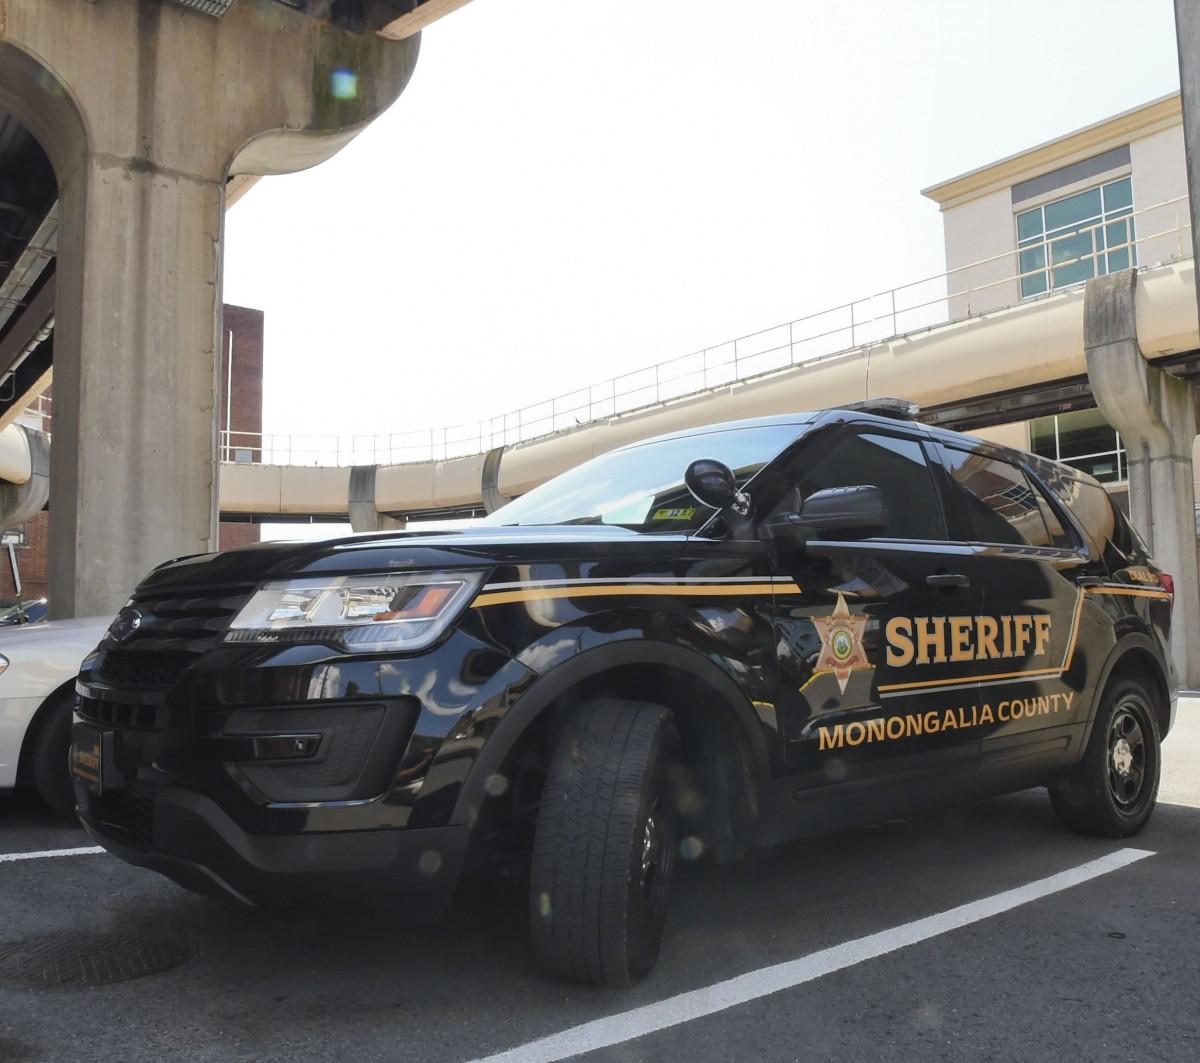 Mon Sheriff police car